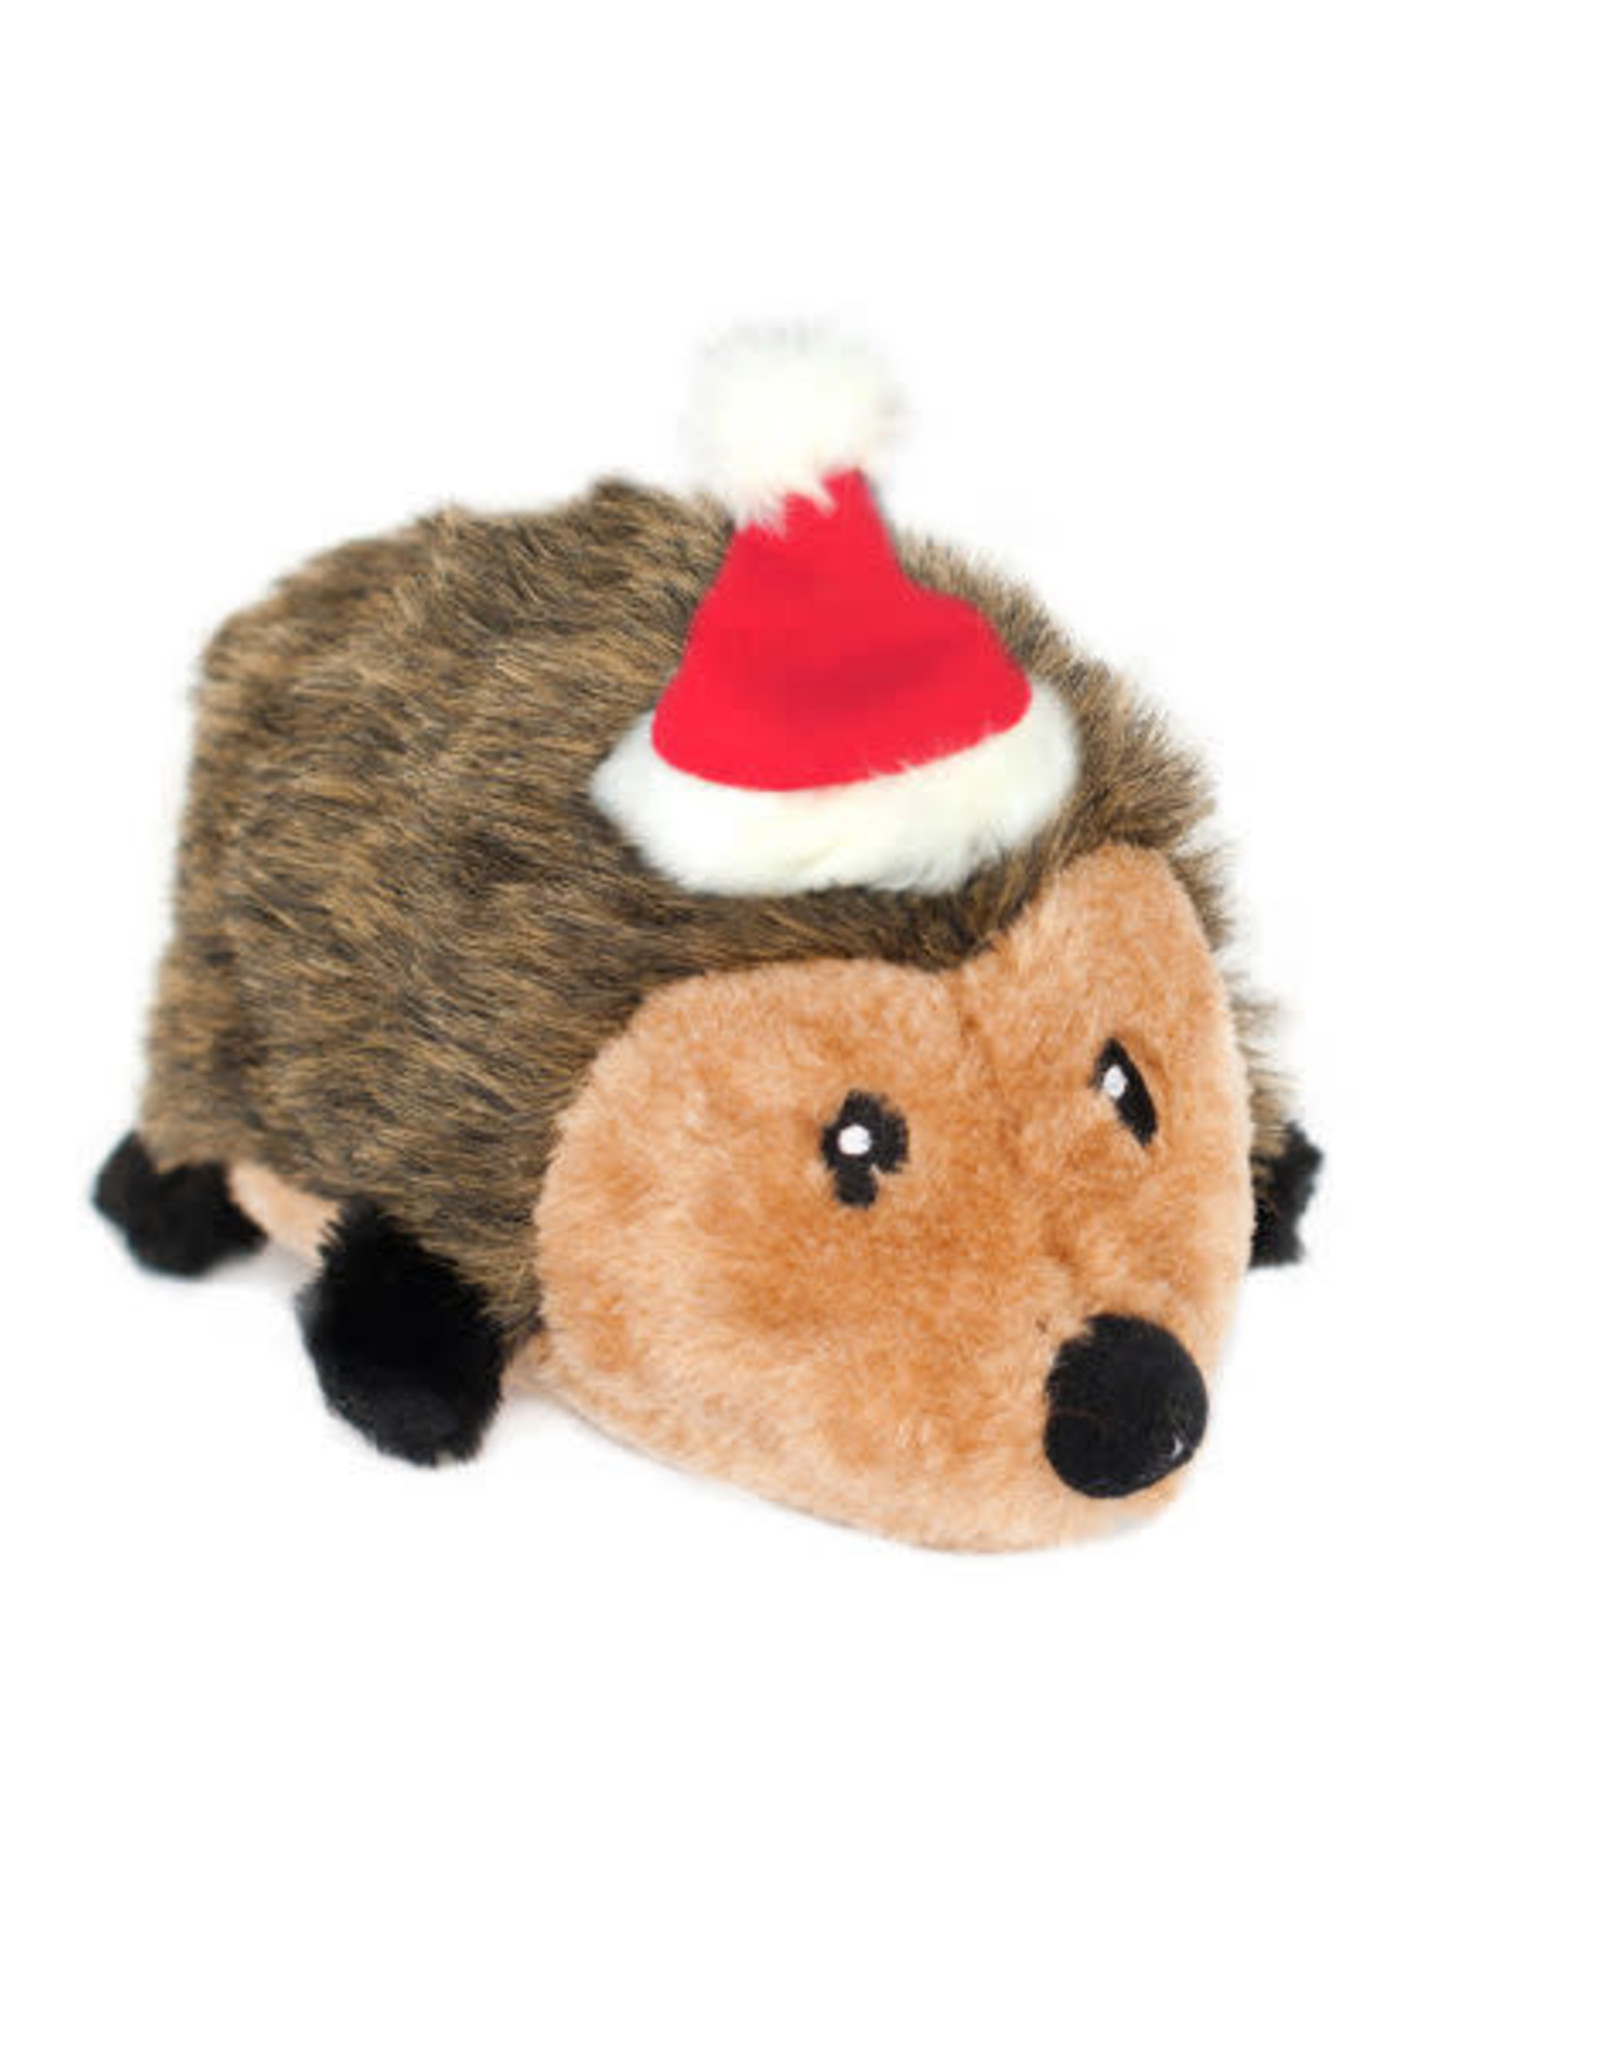 ZippyPaws Zippy Paws Holiday Hedgehog